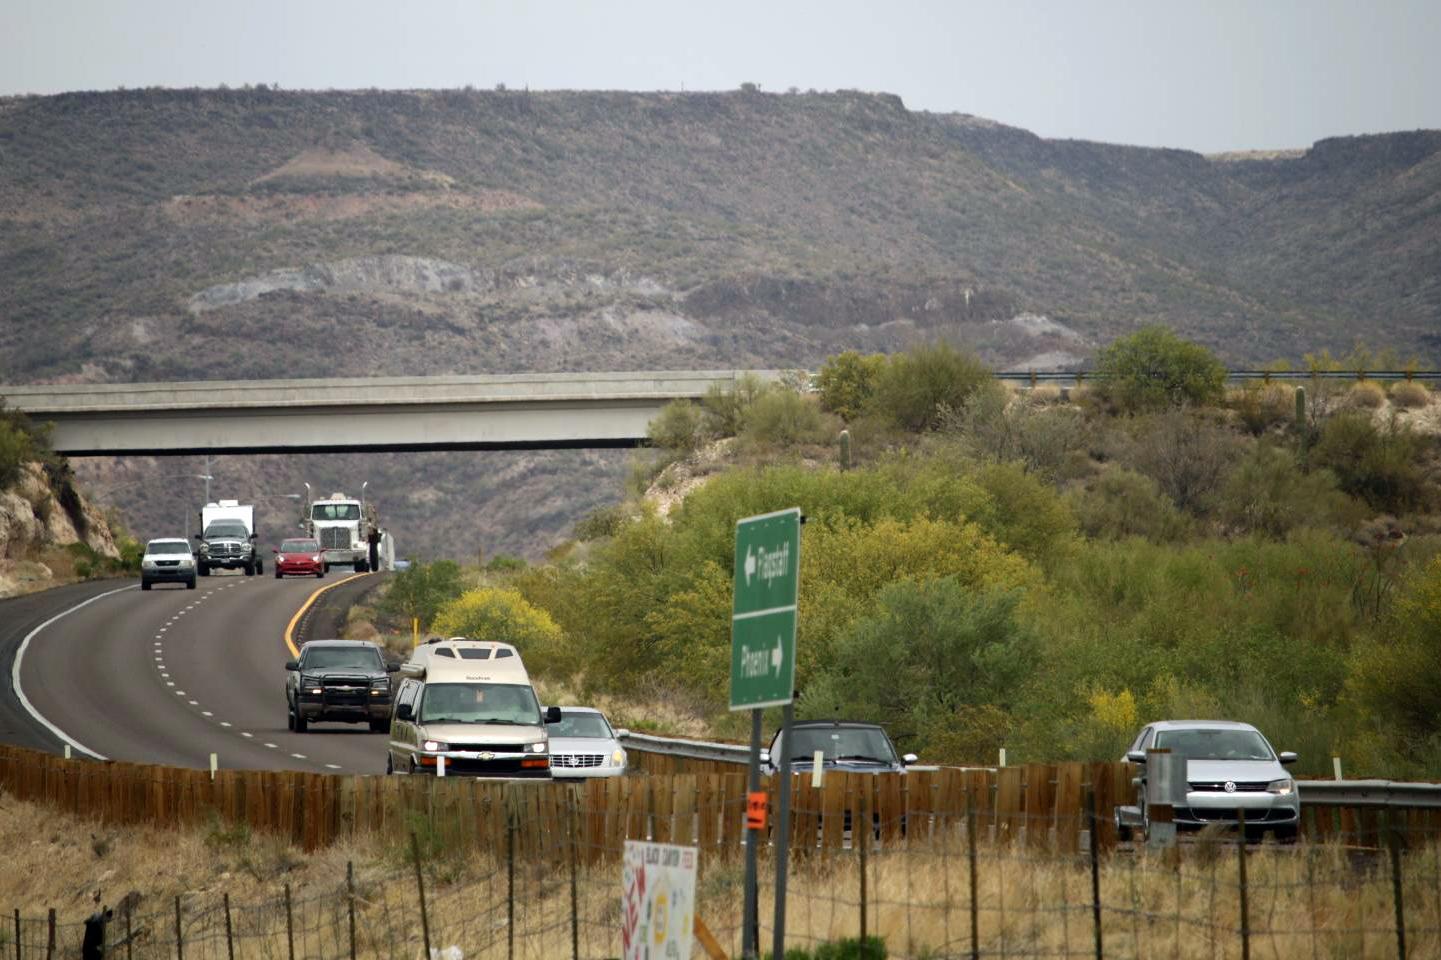 Cars and trucks on I-17